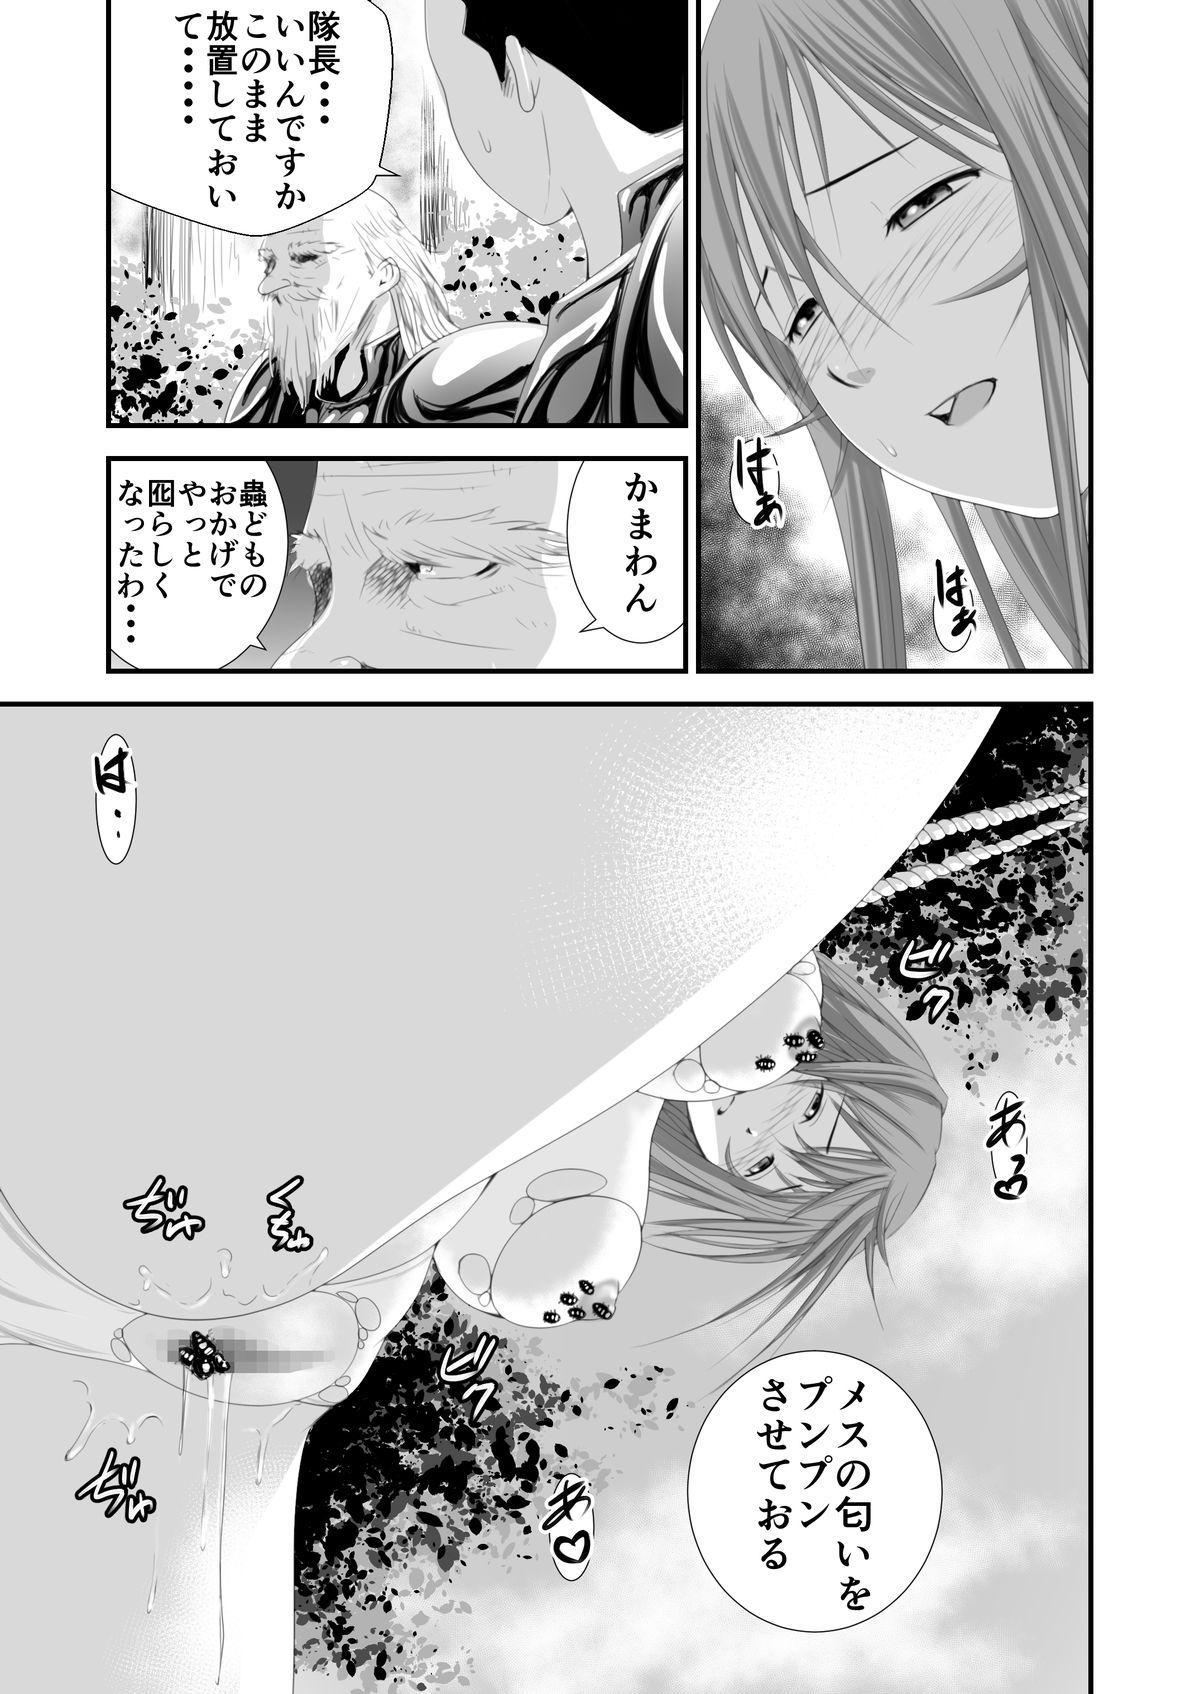 Inma Toubatsu Daisakusen Episode 3 18